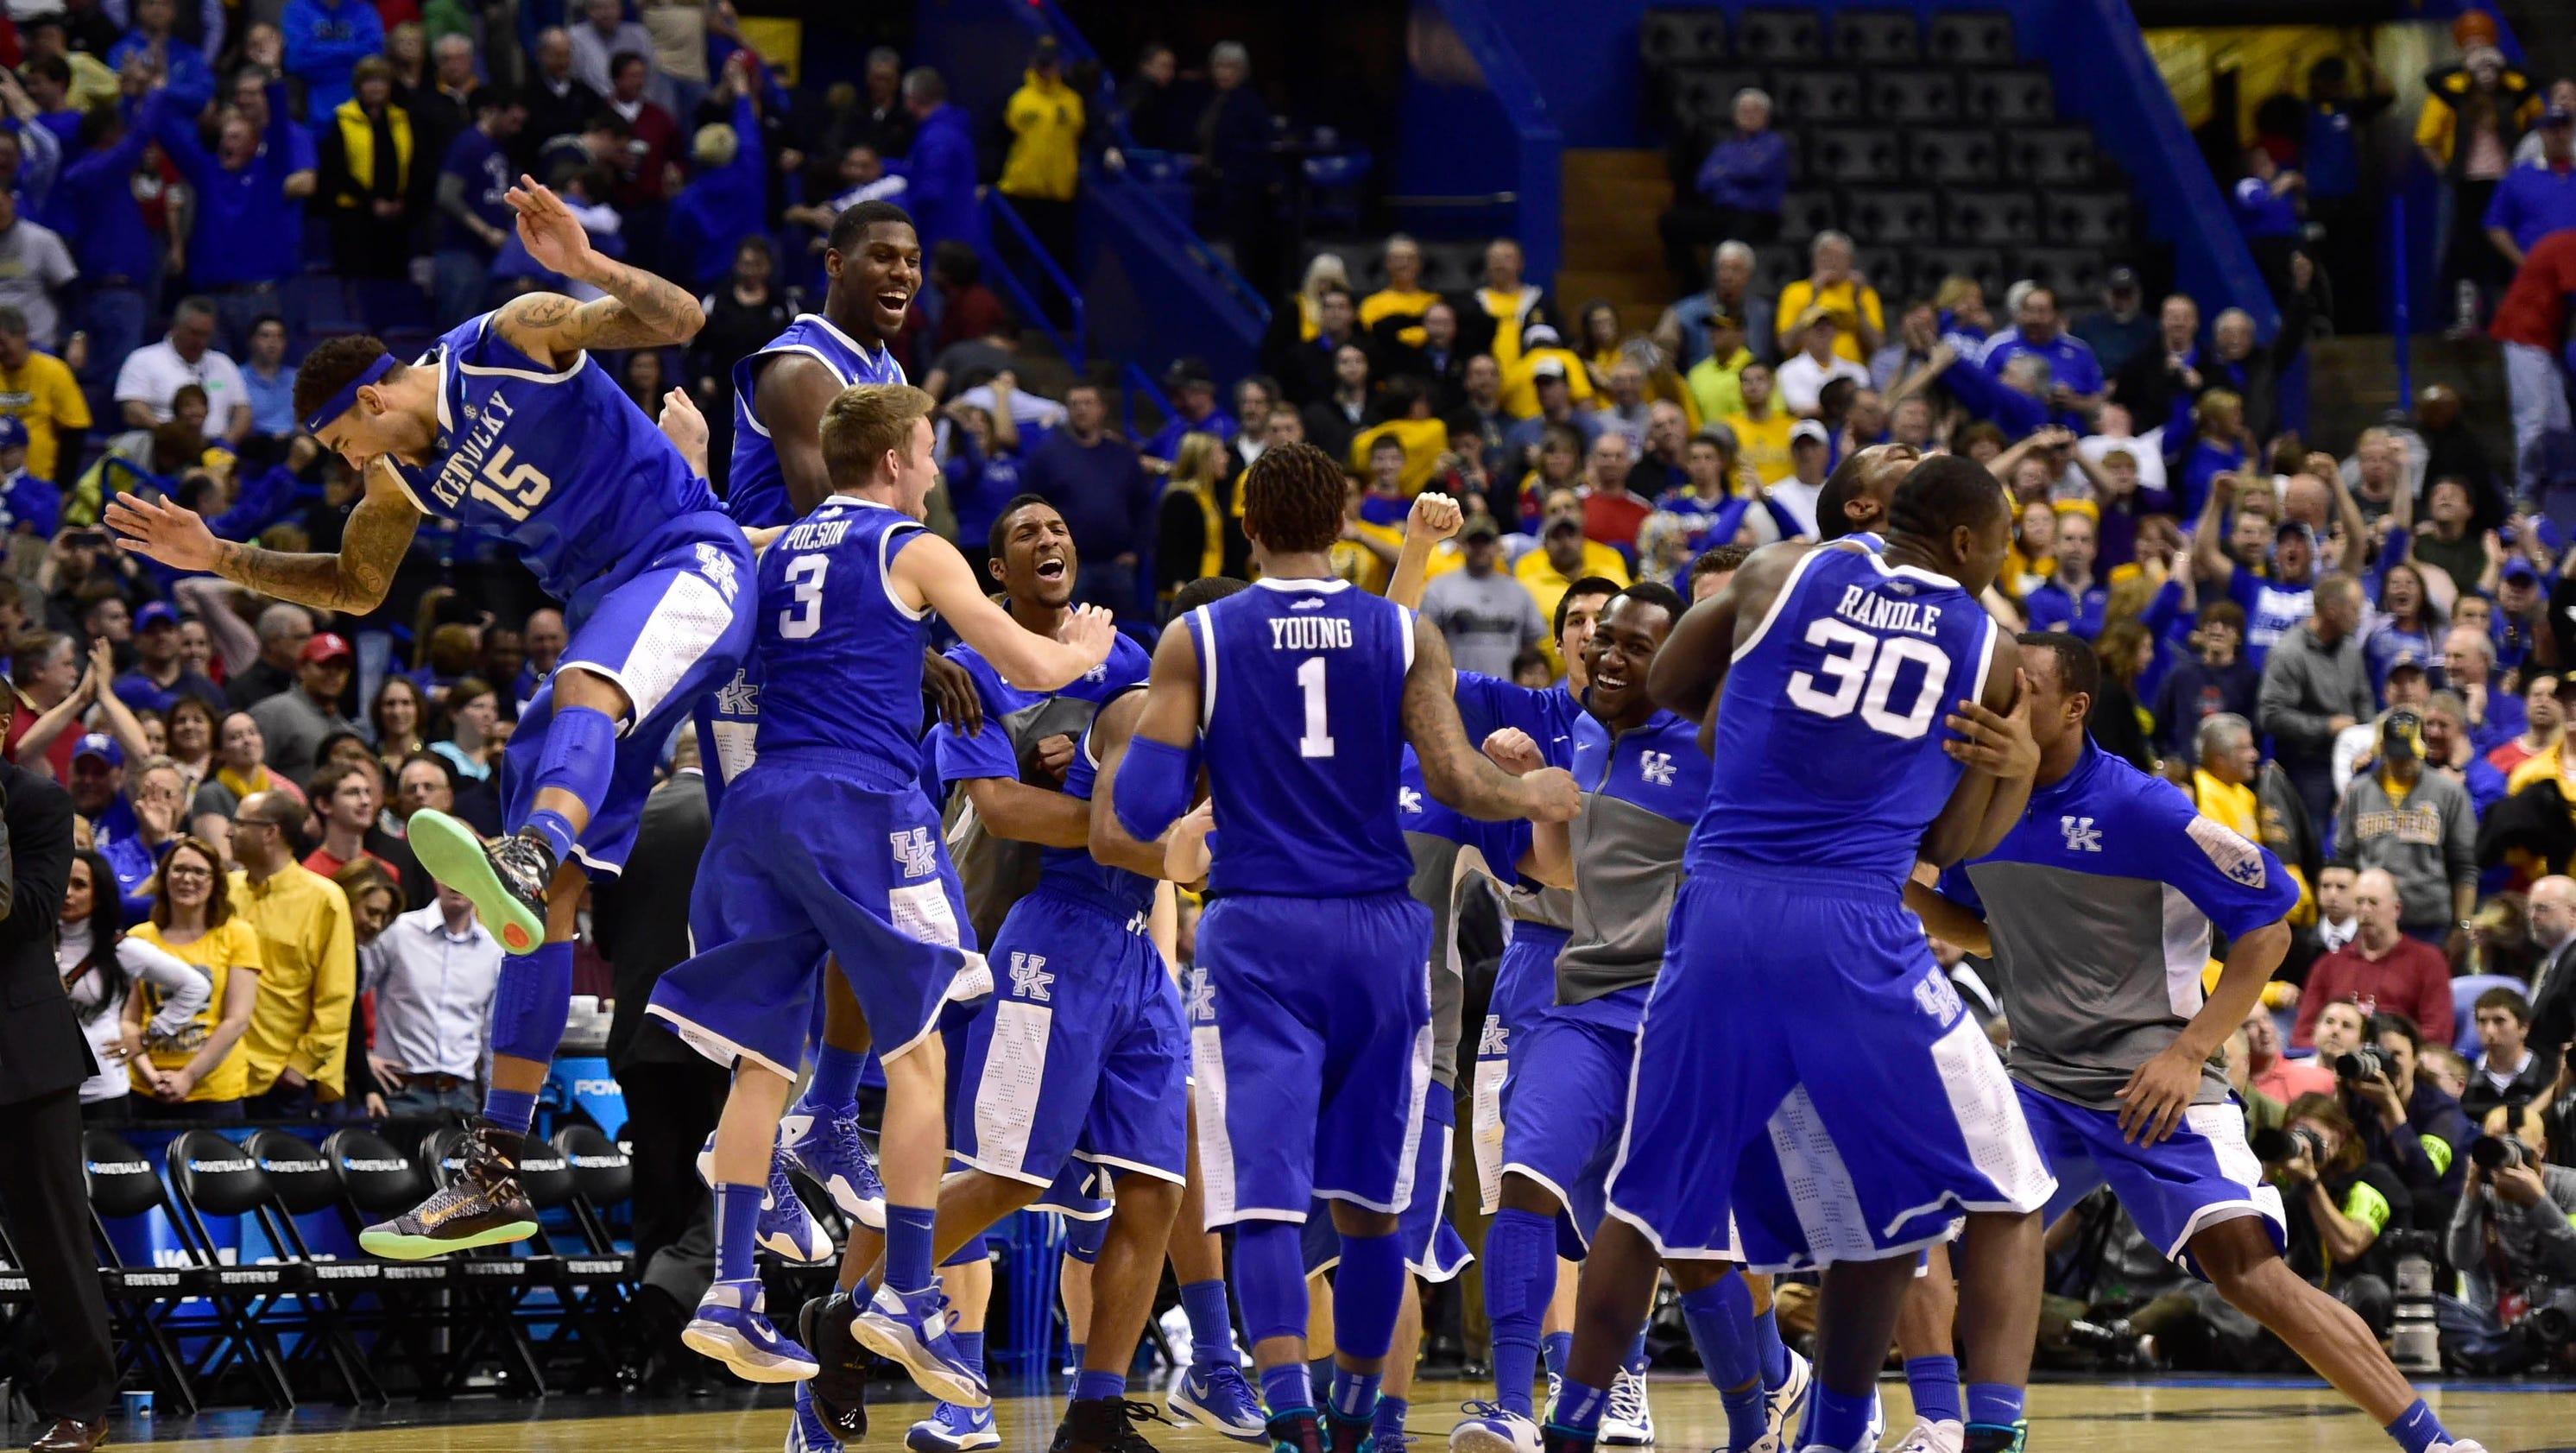 Kentucky Wildcats 2014 15 Men S Basketball Roster: Kentucky, Tennessee Will Join Michigan, Louisville In